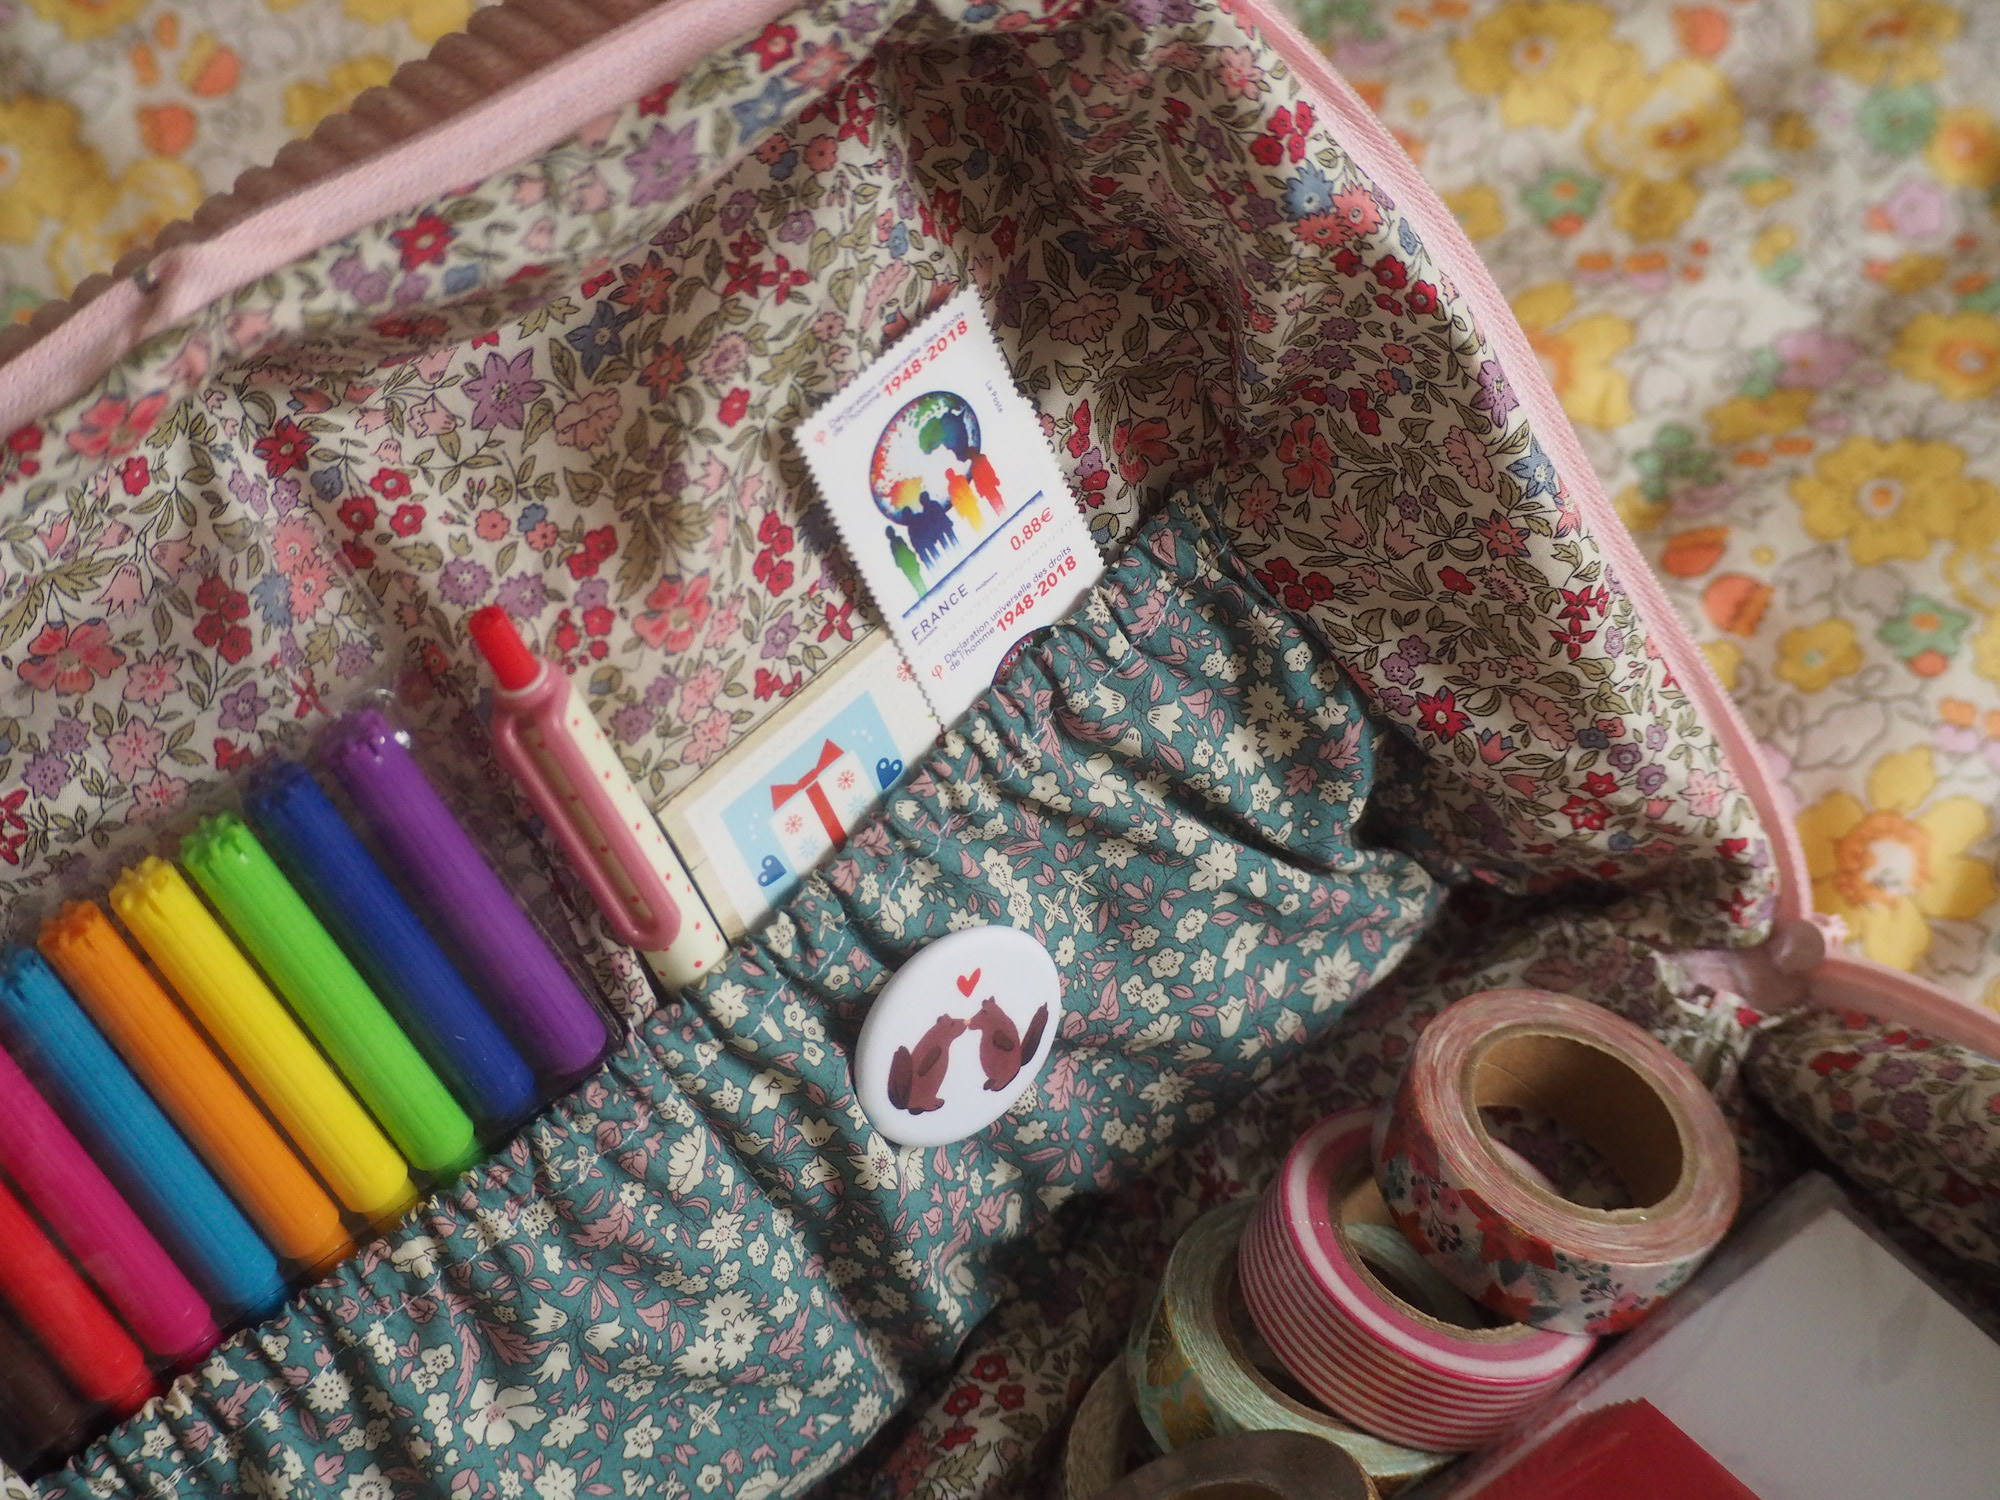 valise creative ritalechat